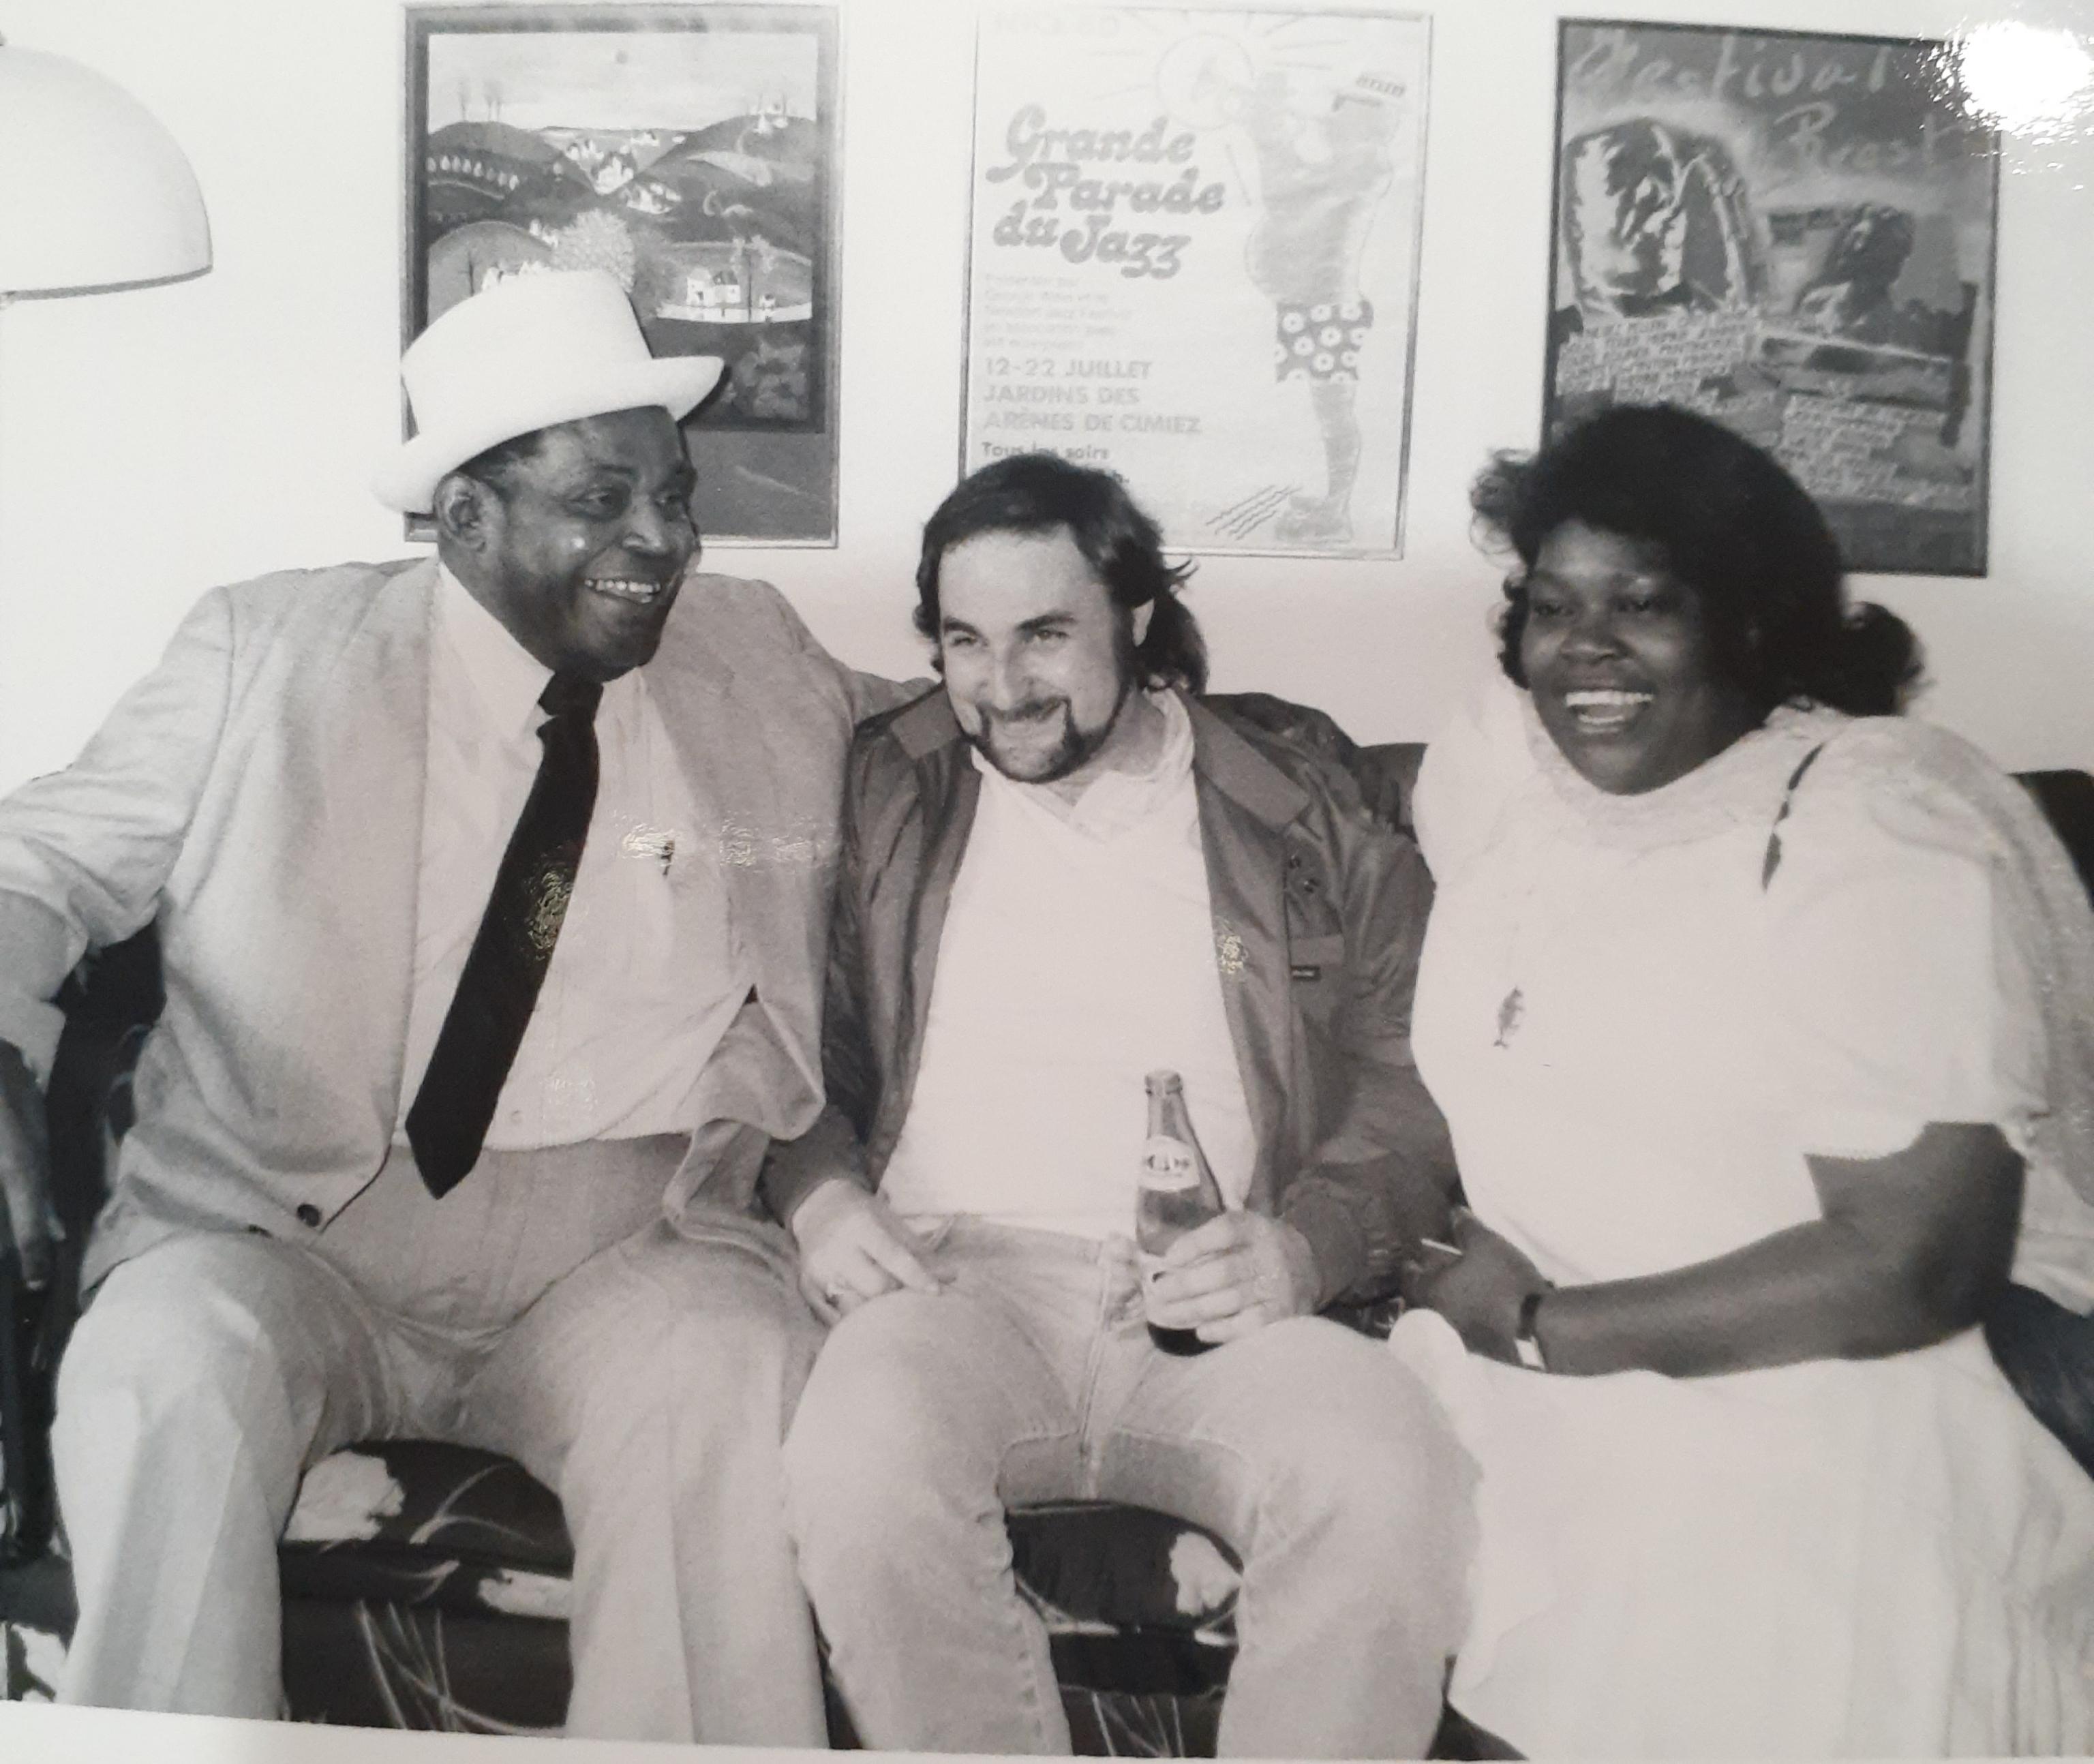 Willie Dixon, Frank Kaplan and Margie Evans